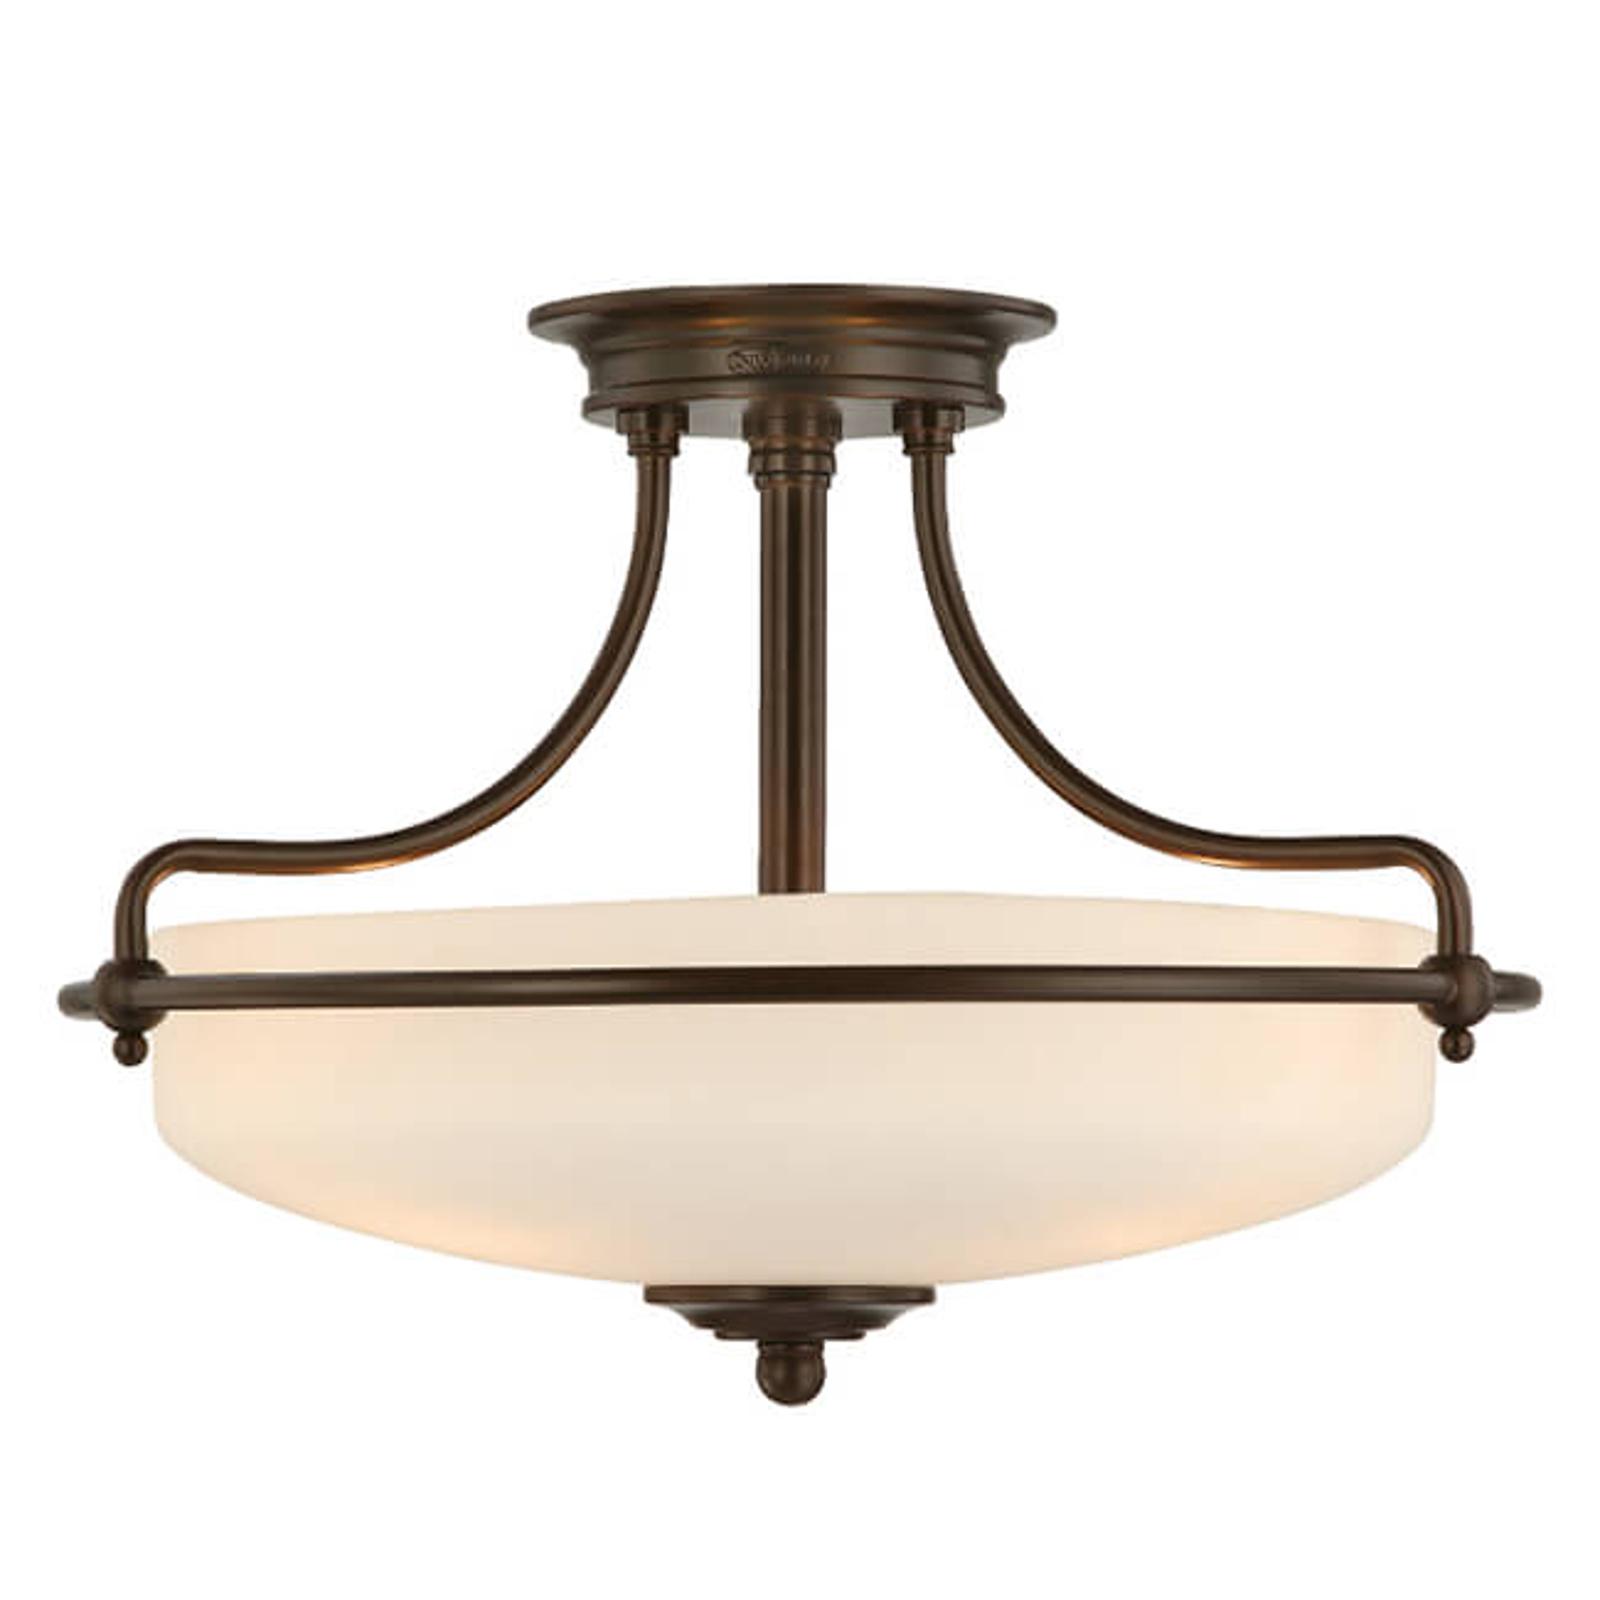 Plafondlamp Griffin, Ø 43 cm, brons